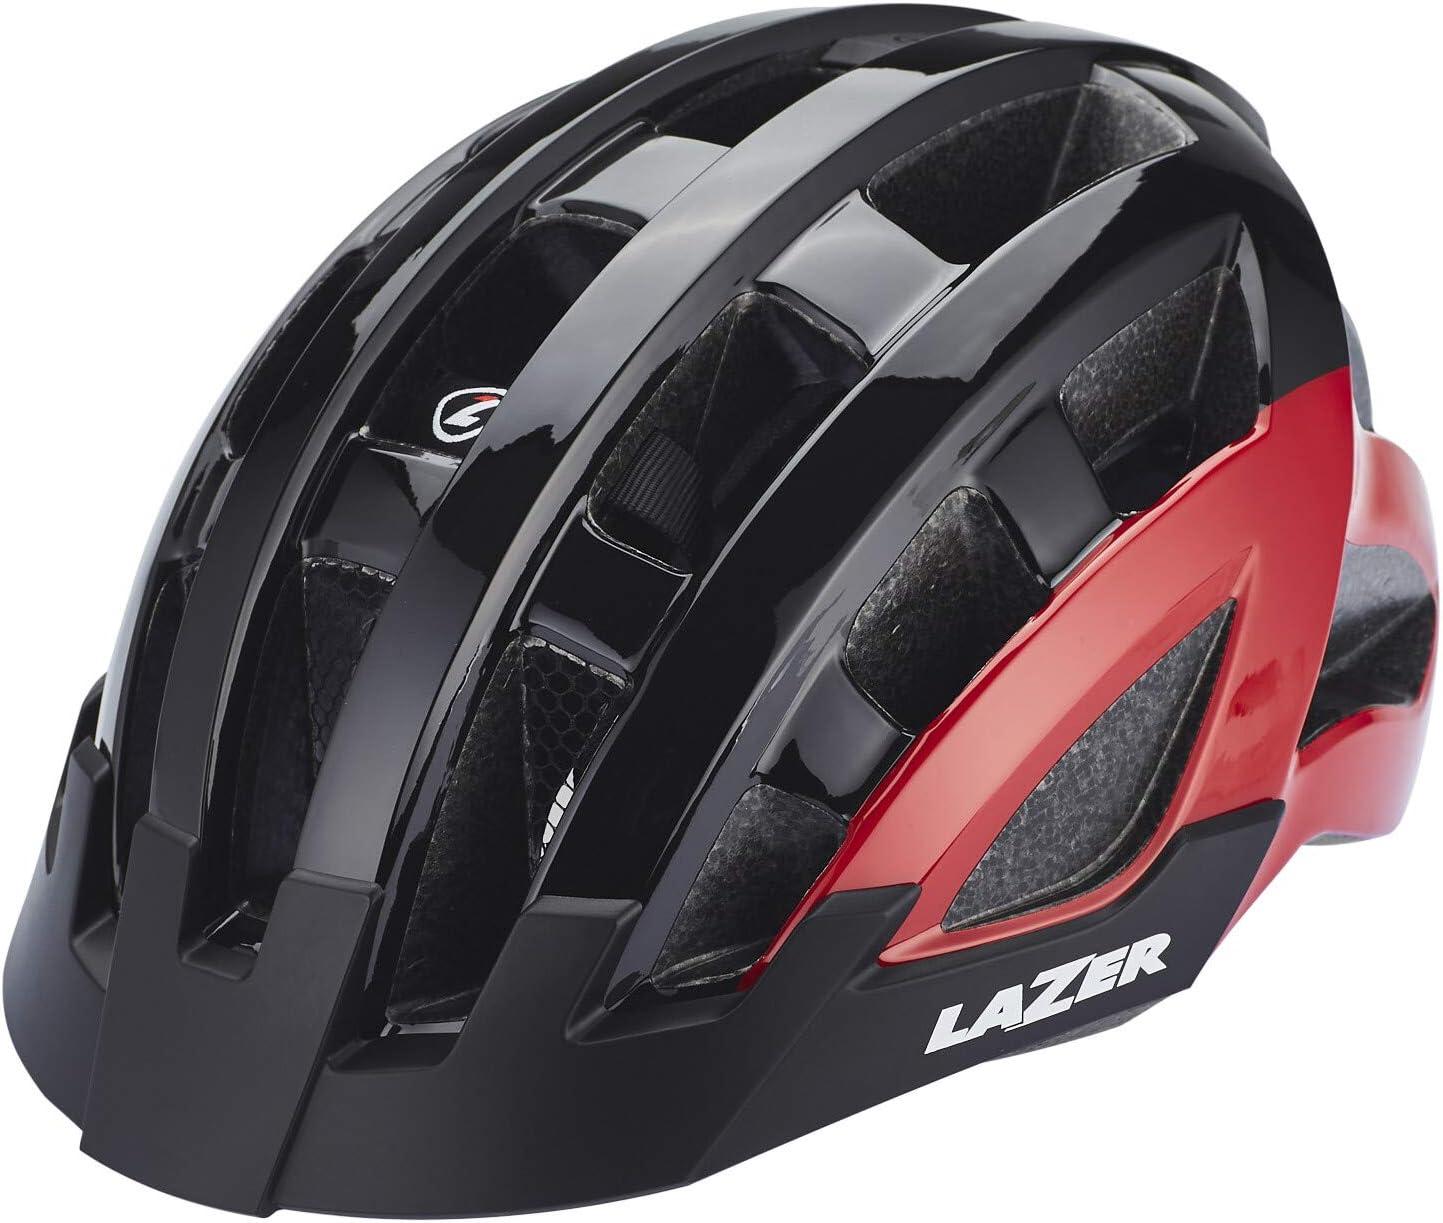 Flash Yellow Uni-Adult Lazer Compact DLX MIPS Helmet